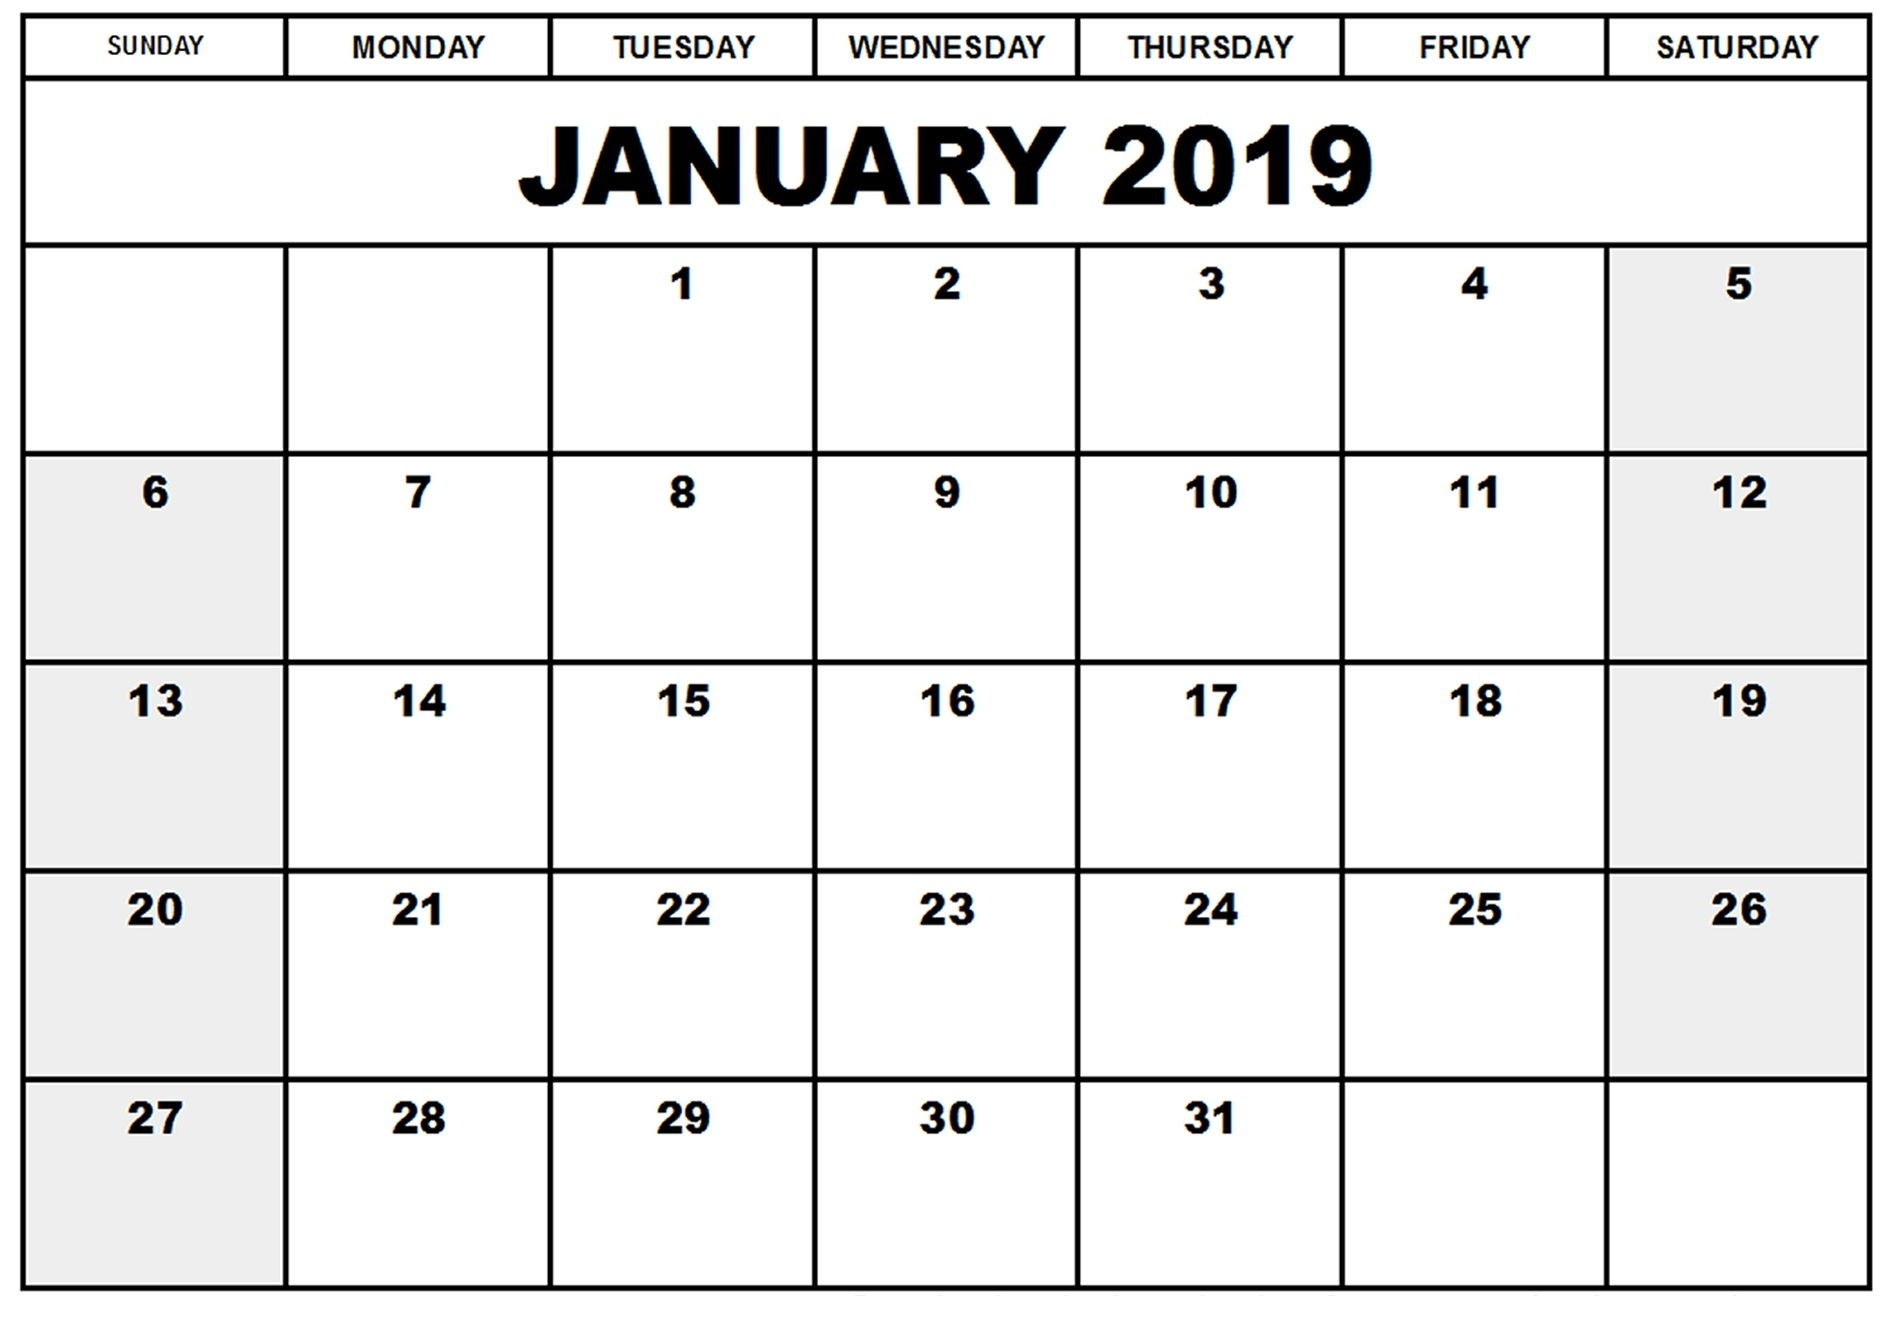 January 2019 Calendar Printable Blank Templates - Free Word